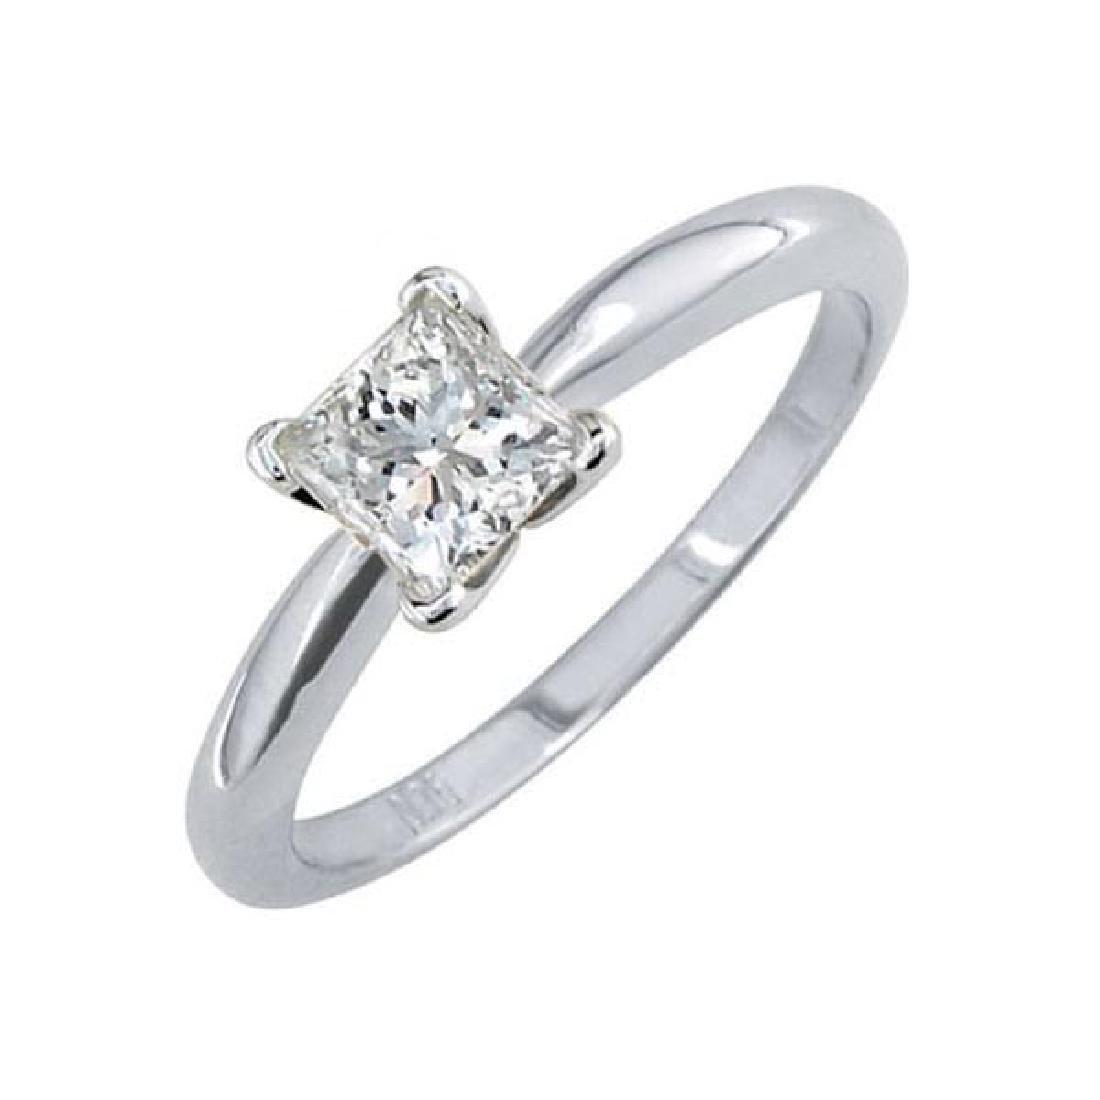 Certified 1.22 CTW Princess Diamond Solitaire 14k Ring